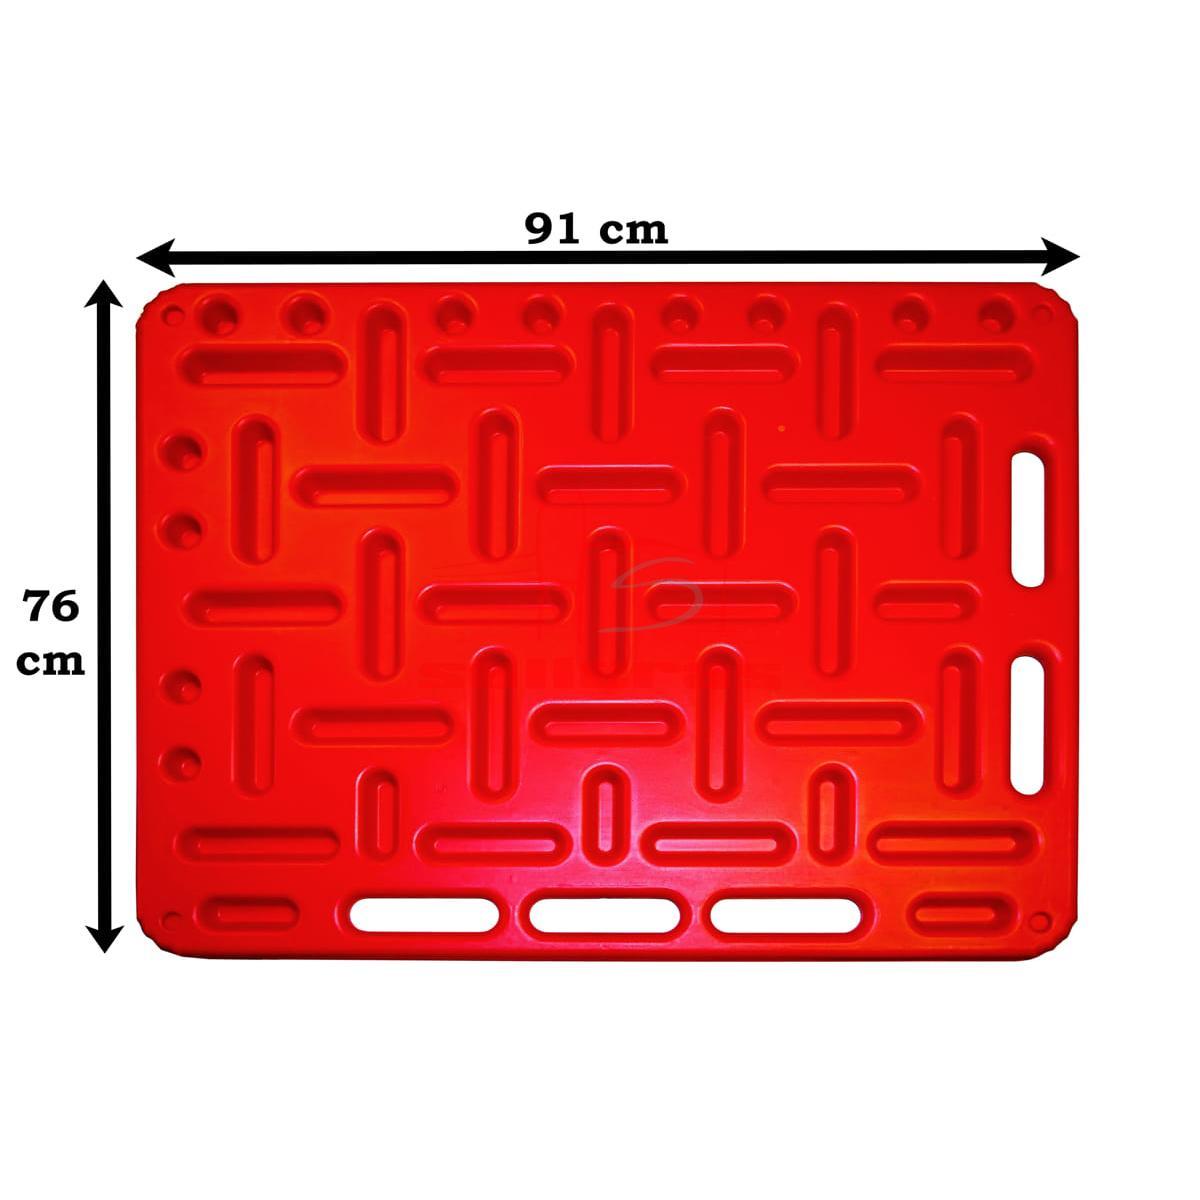 Dos paneles rojos para empujar ganado